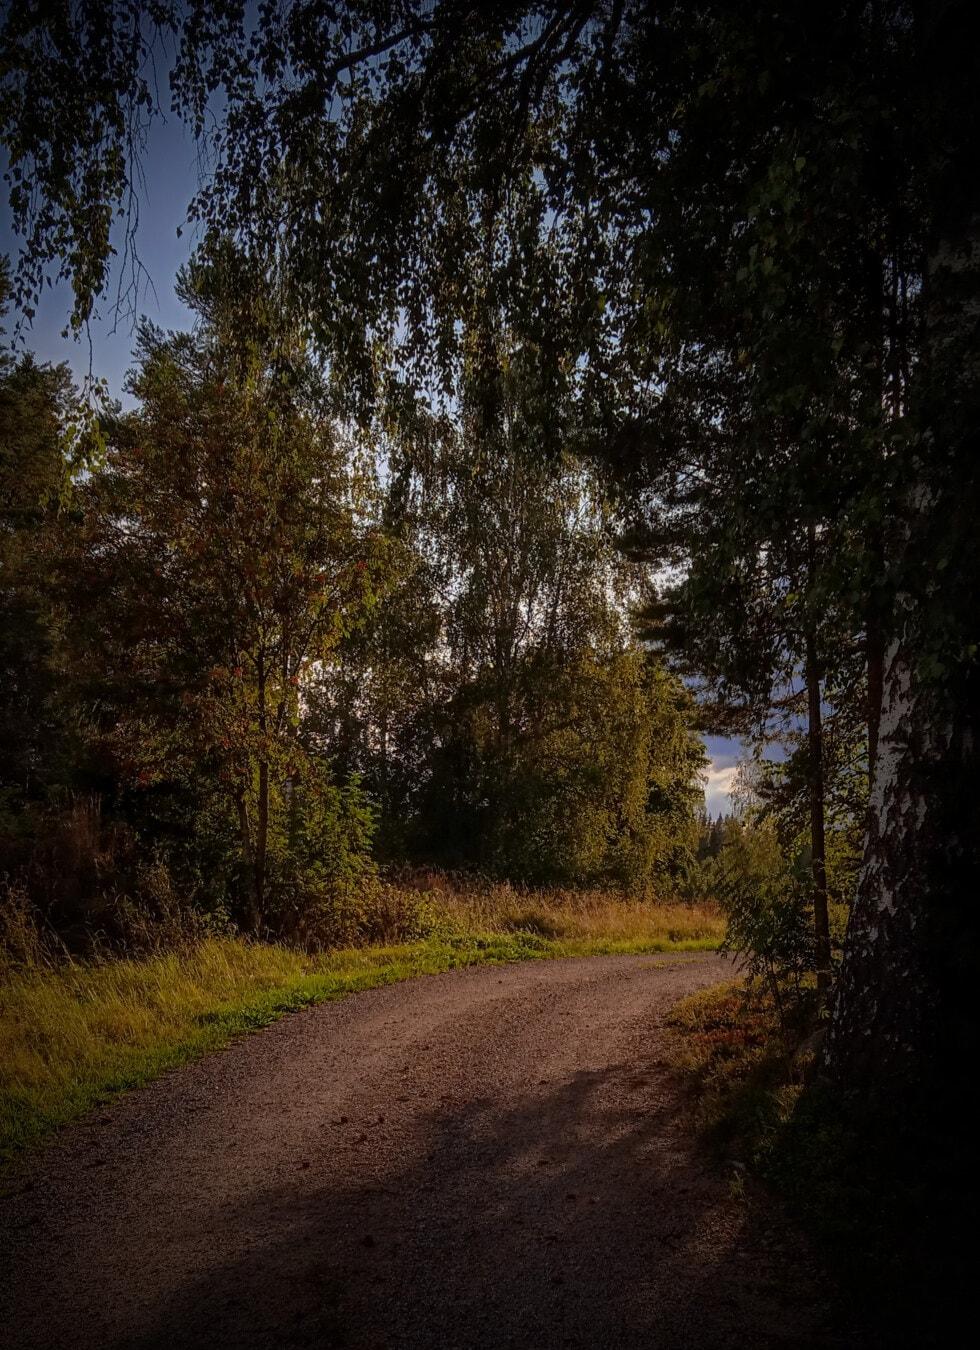 Forststraße, Schatten, Straße, Wald, Landschaft, Bäume, Struktur, Herbst, Park, Holz